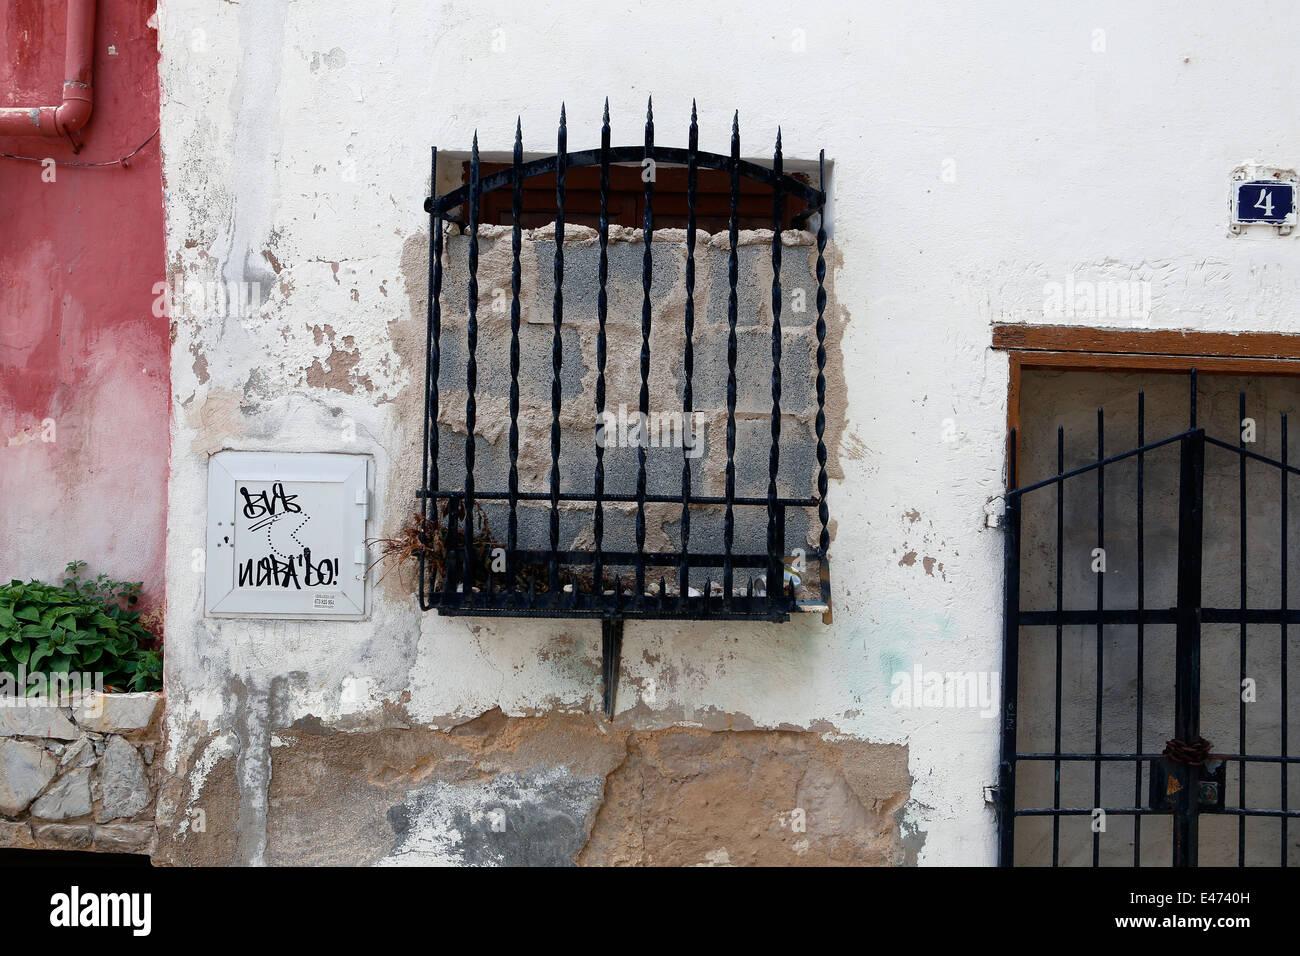 antique walls and persian blinds in palma de majorca spain stock